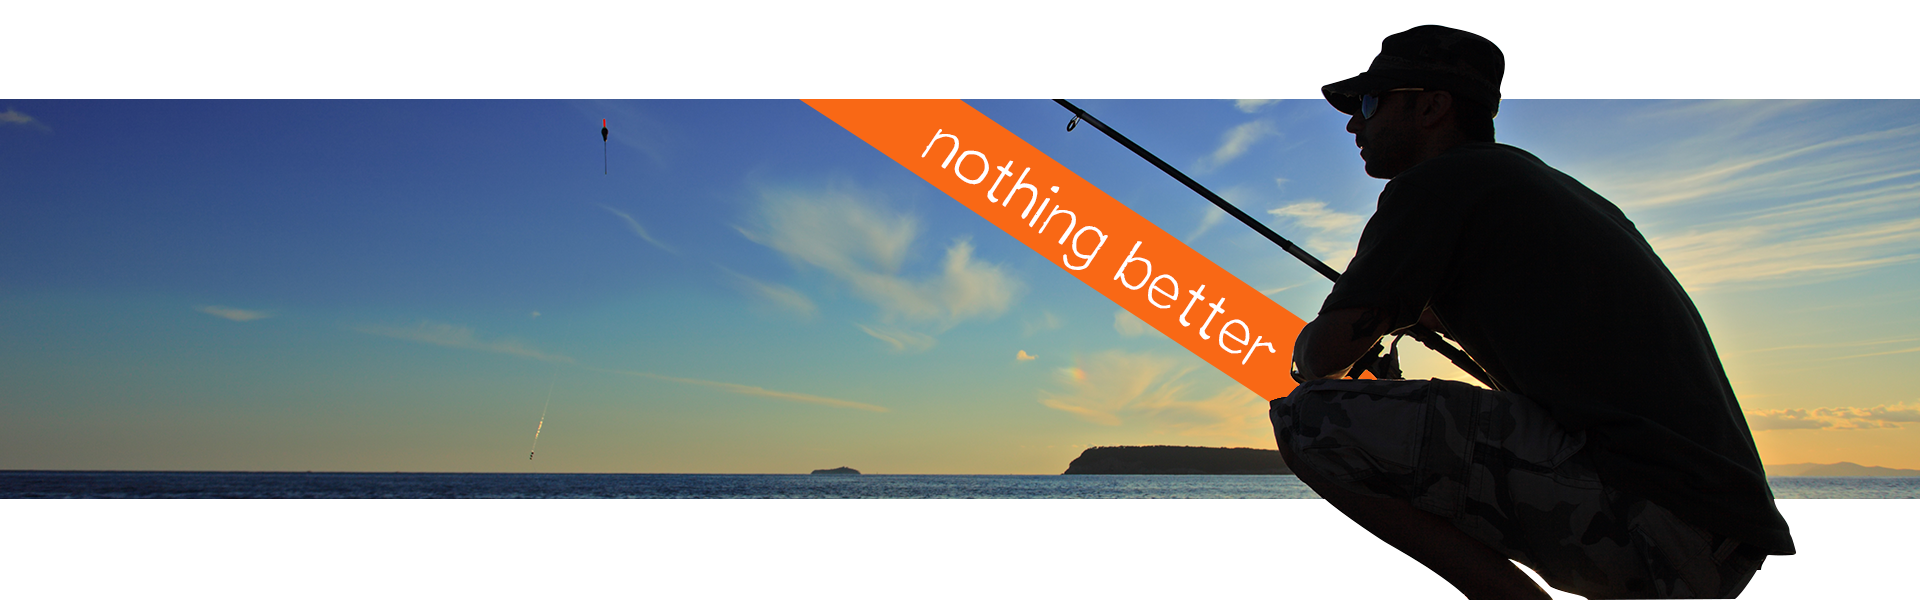 nothing-better-fisherman-at-sunset